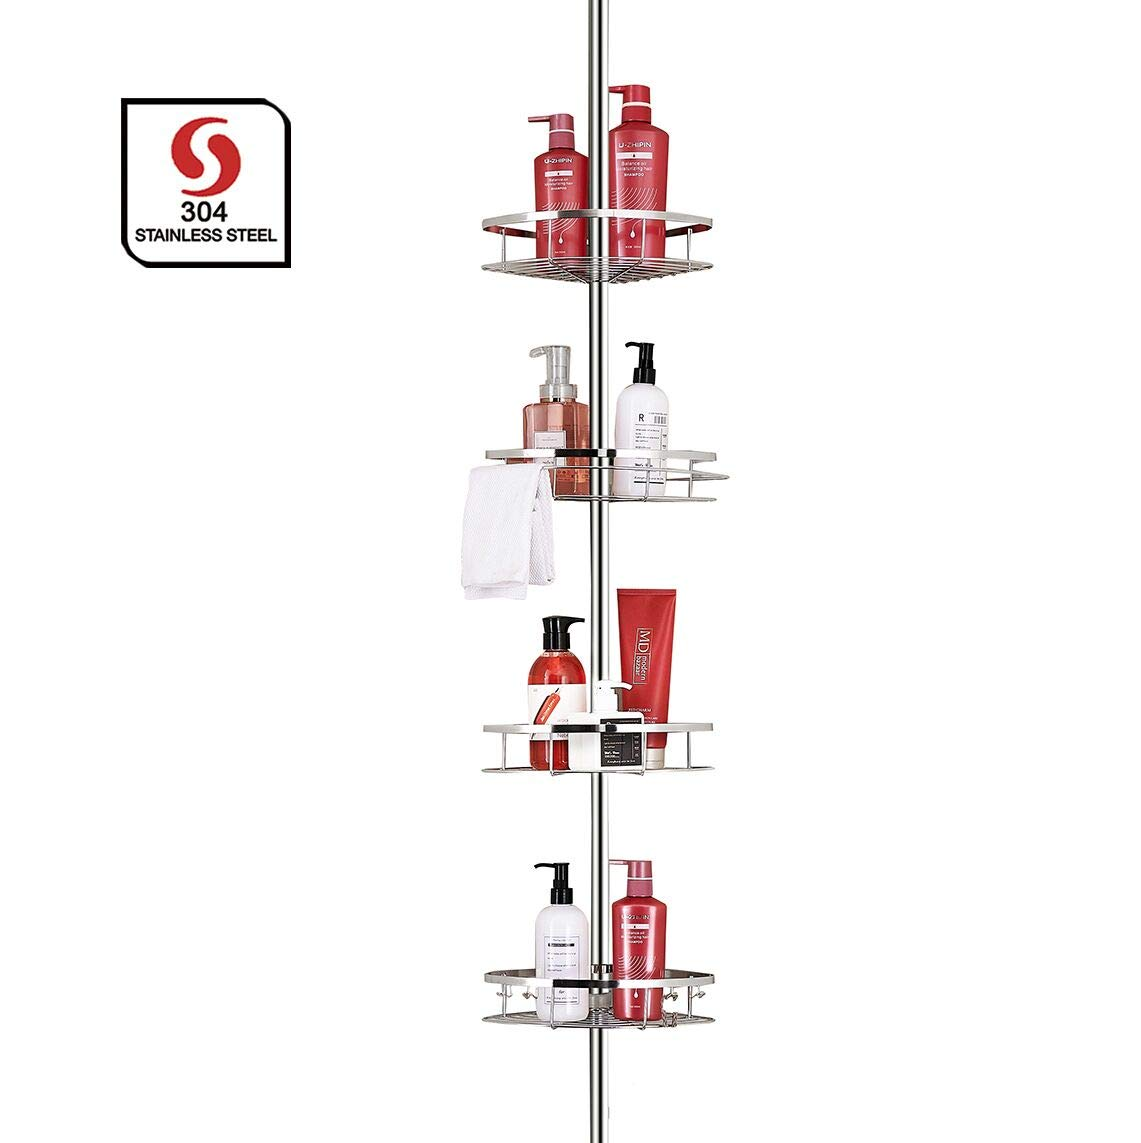 SeiriOne Bathroom Shelf, Tension Shower Pole Corner Caddy, Rustproof 304 Stainless Steel, 4 Tier Adjustable Baskets, Height Adjustable 4.7 to 9.3ft by SeiriOne